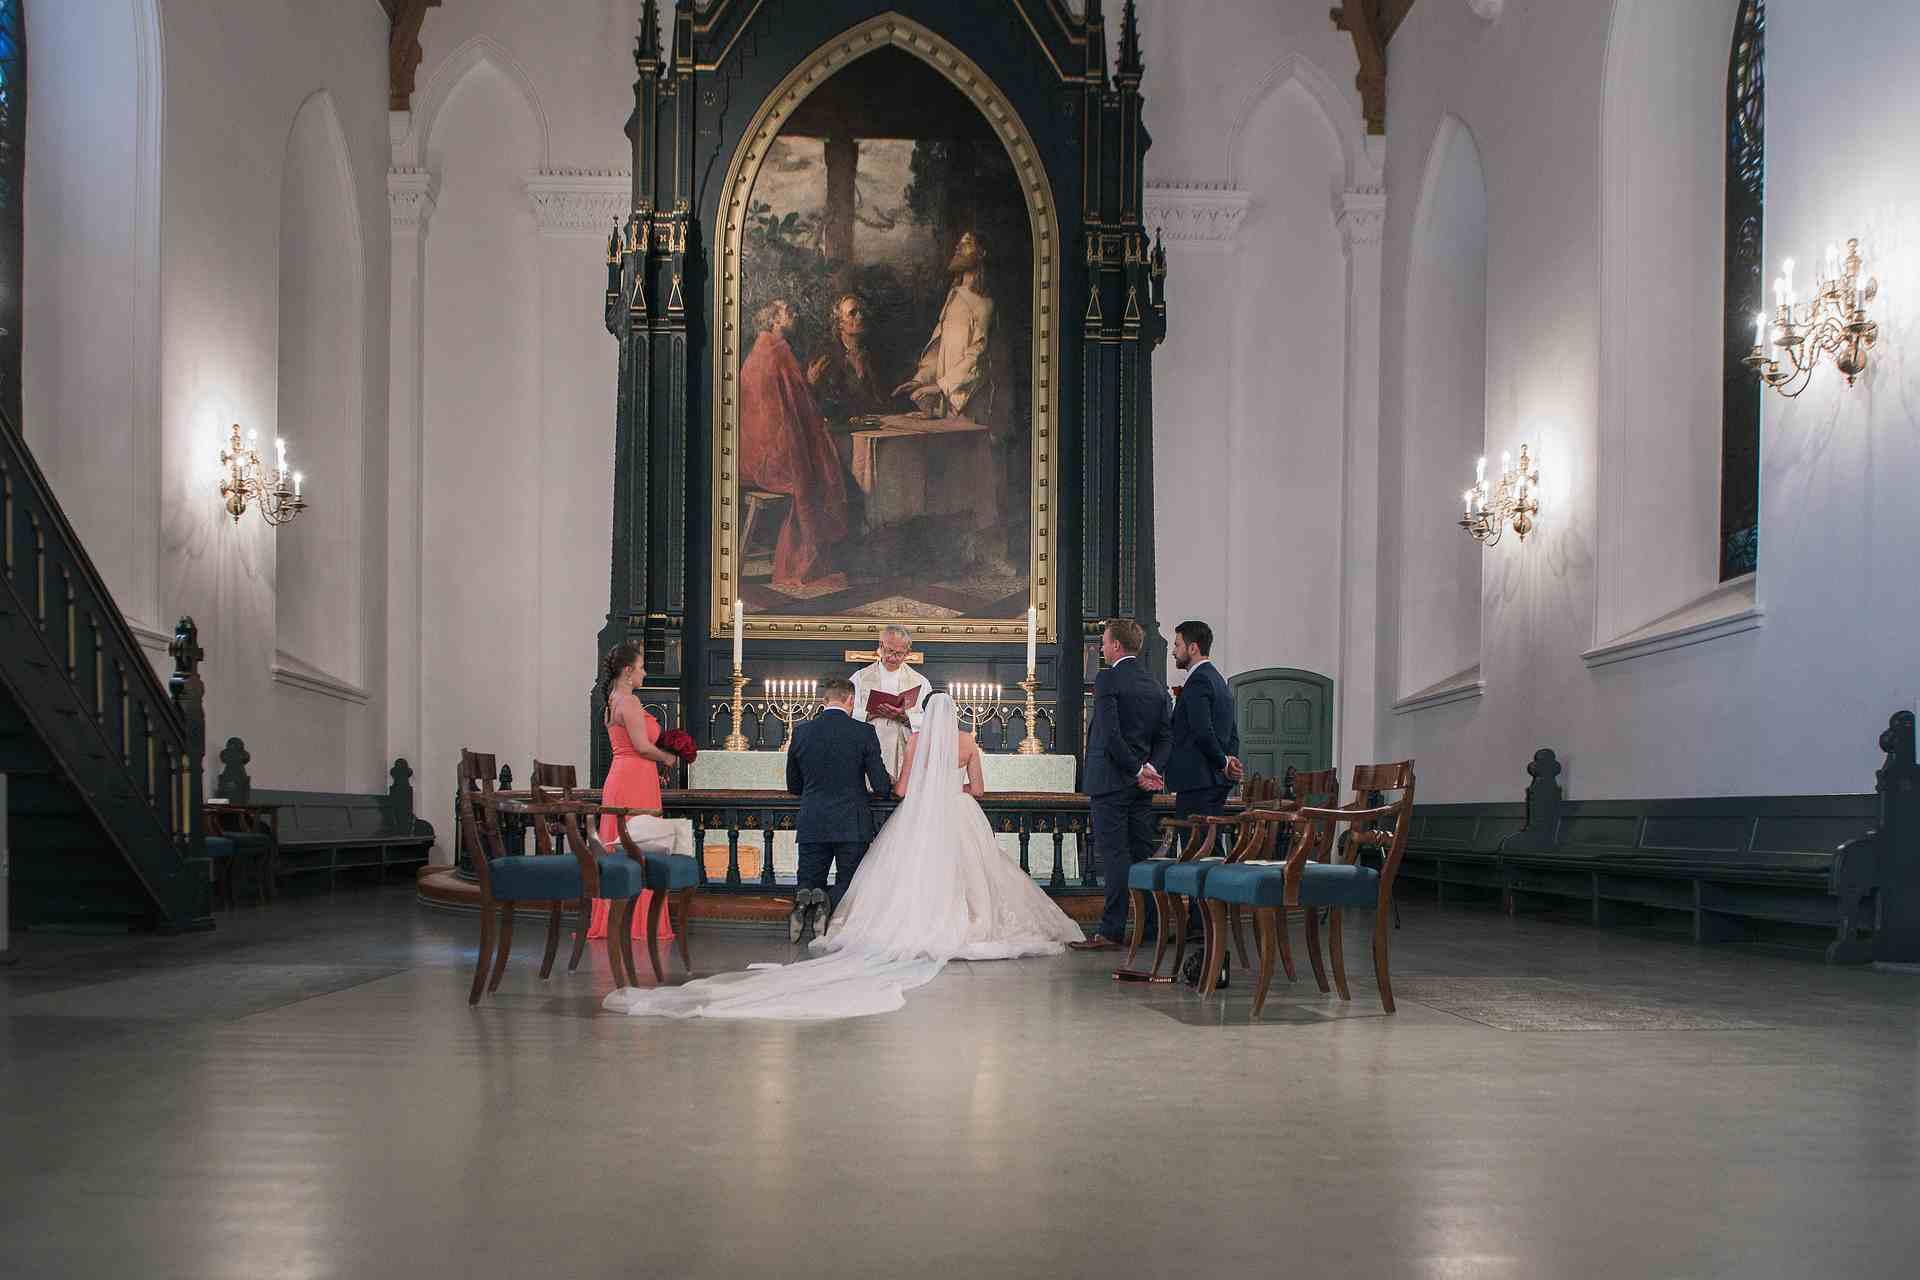 Wedding photographer in Norway